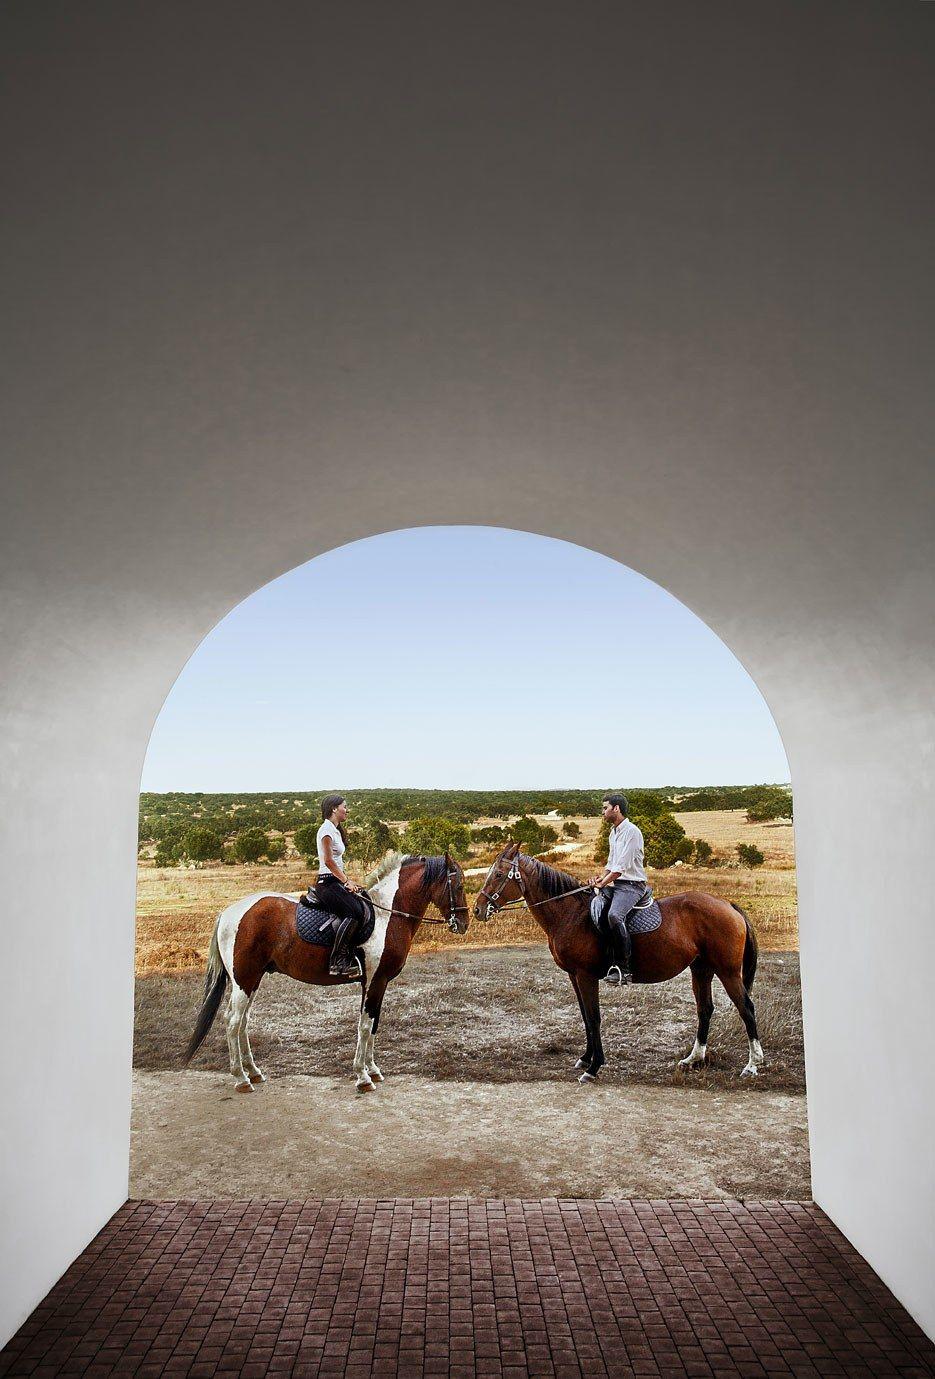 Eternal Sunshine in Portugal's Alentejo